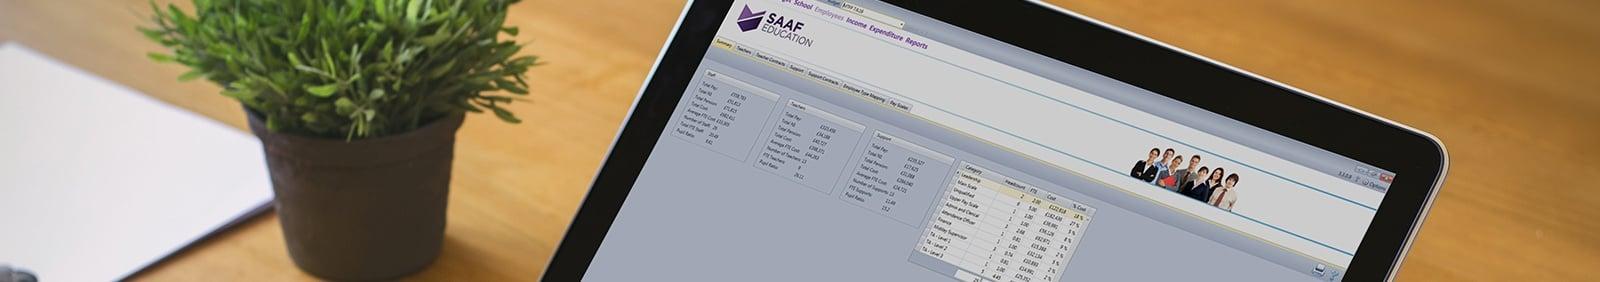 menu-bg-software.jpg